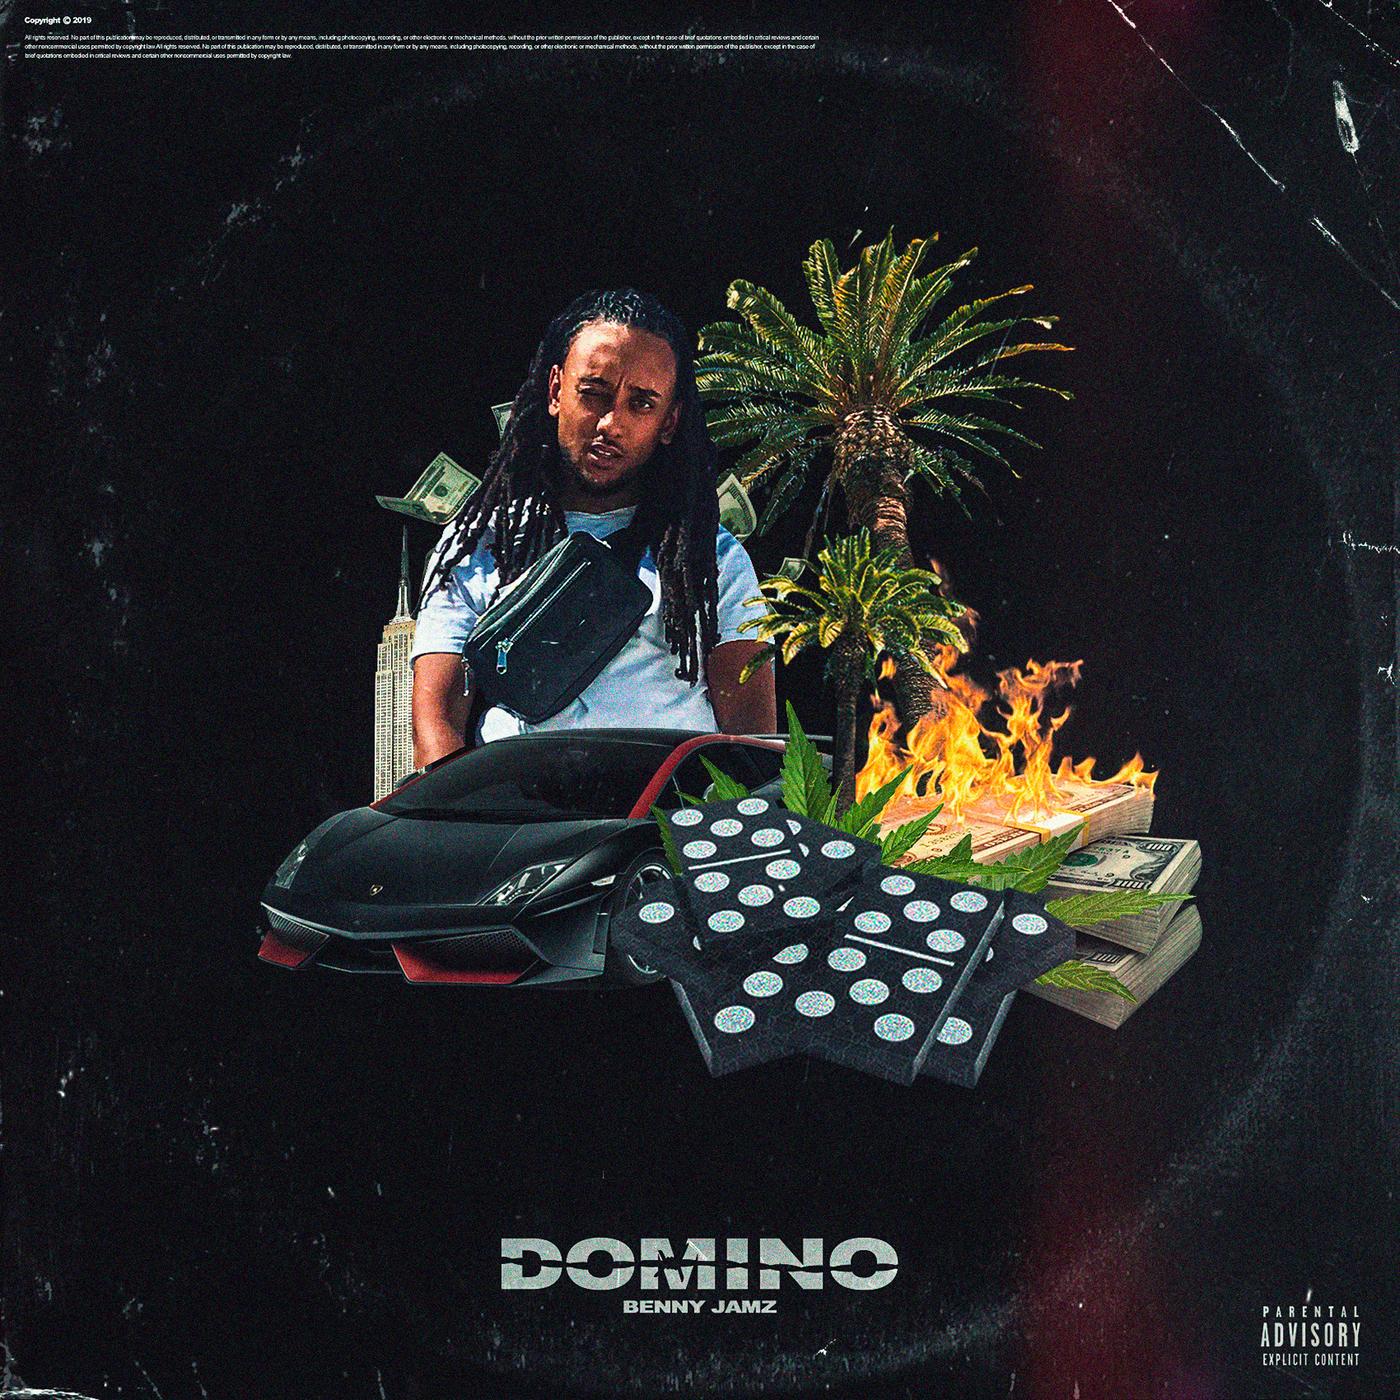 Domino - Benny Jamz